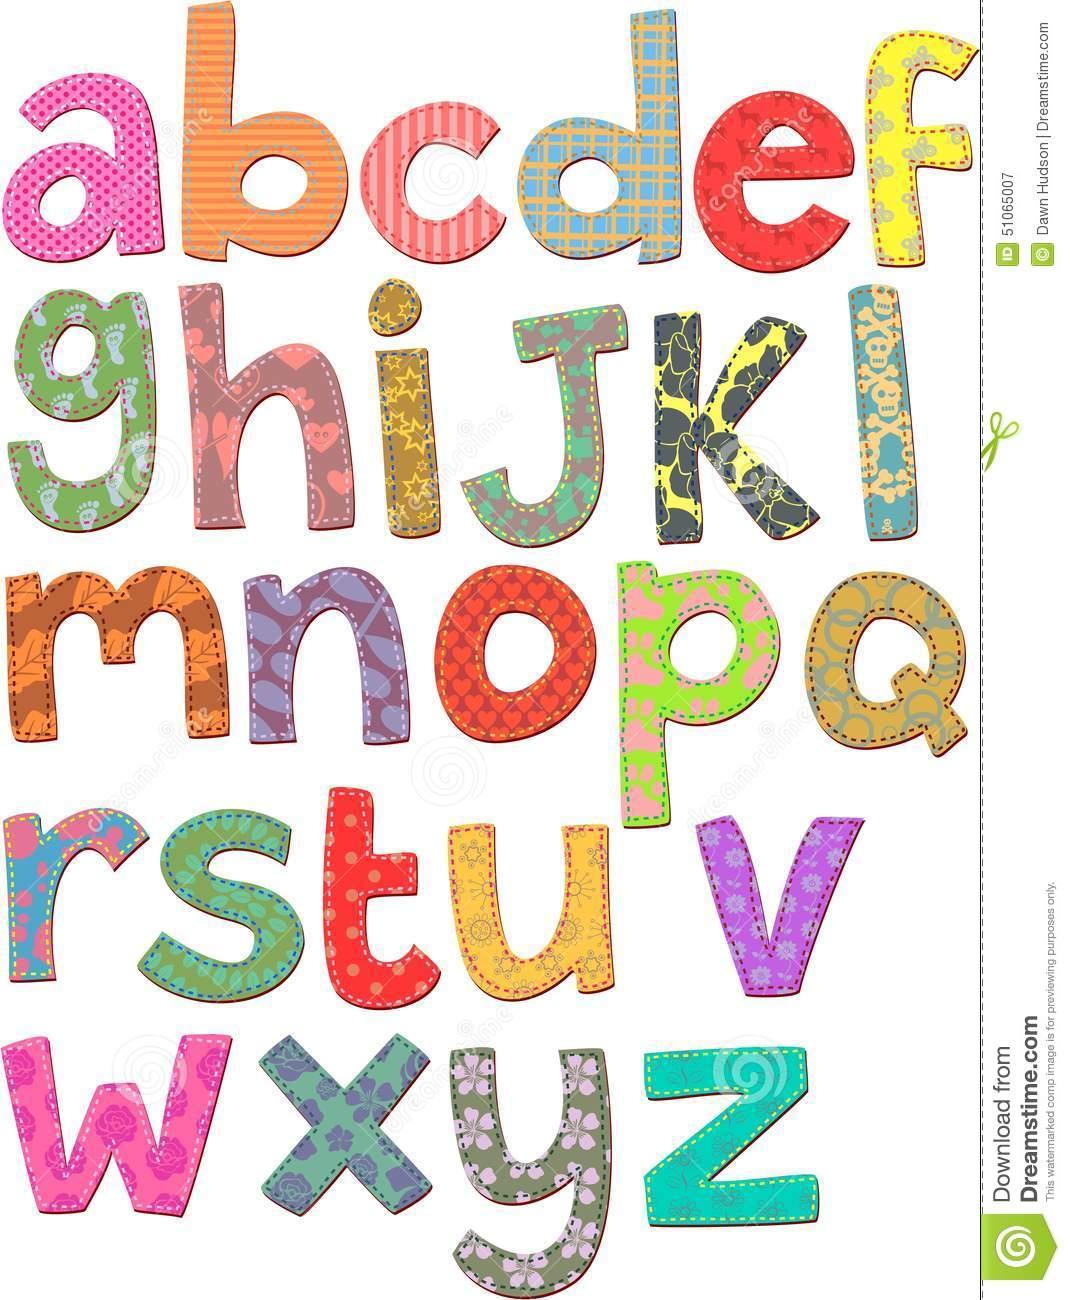 Alphabet Clip Art Stock Illustration - Image: 51065007 graphic free download